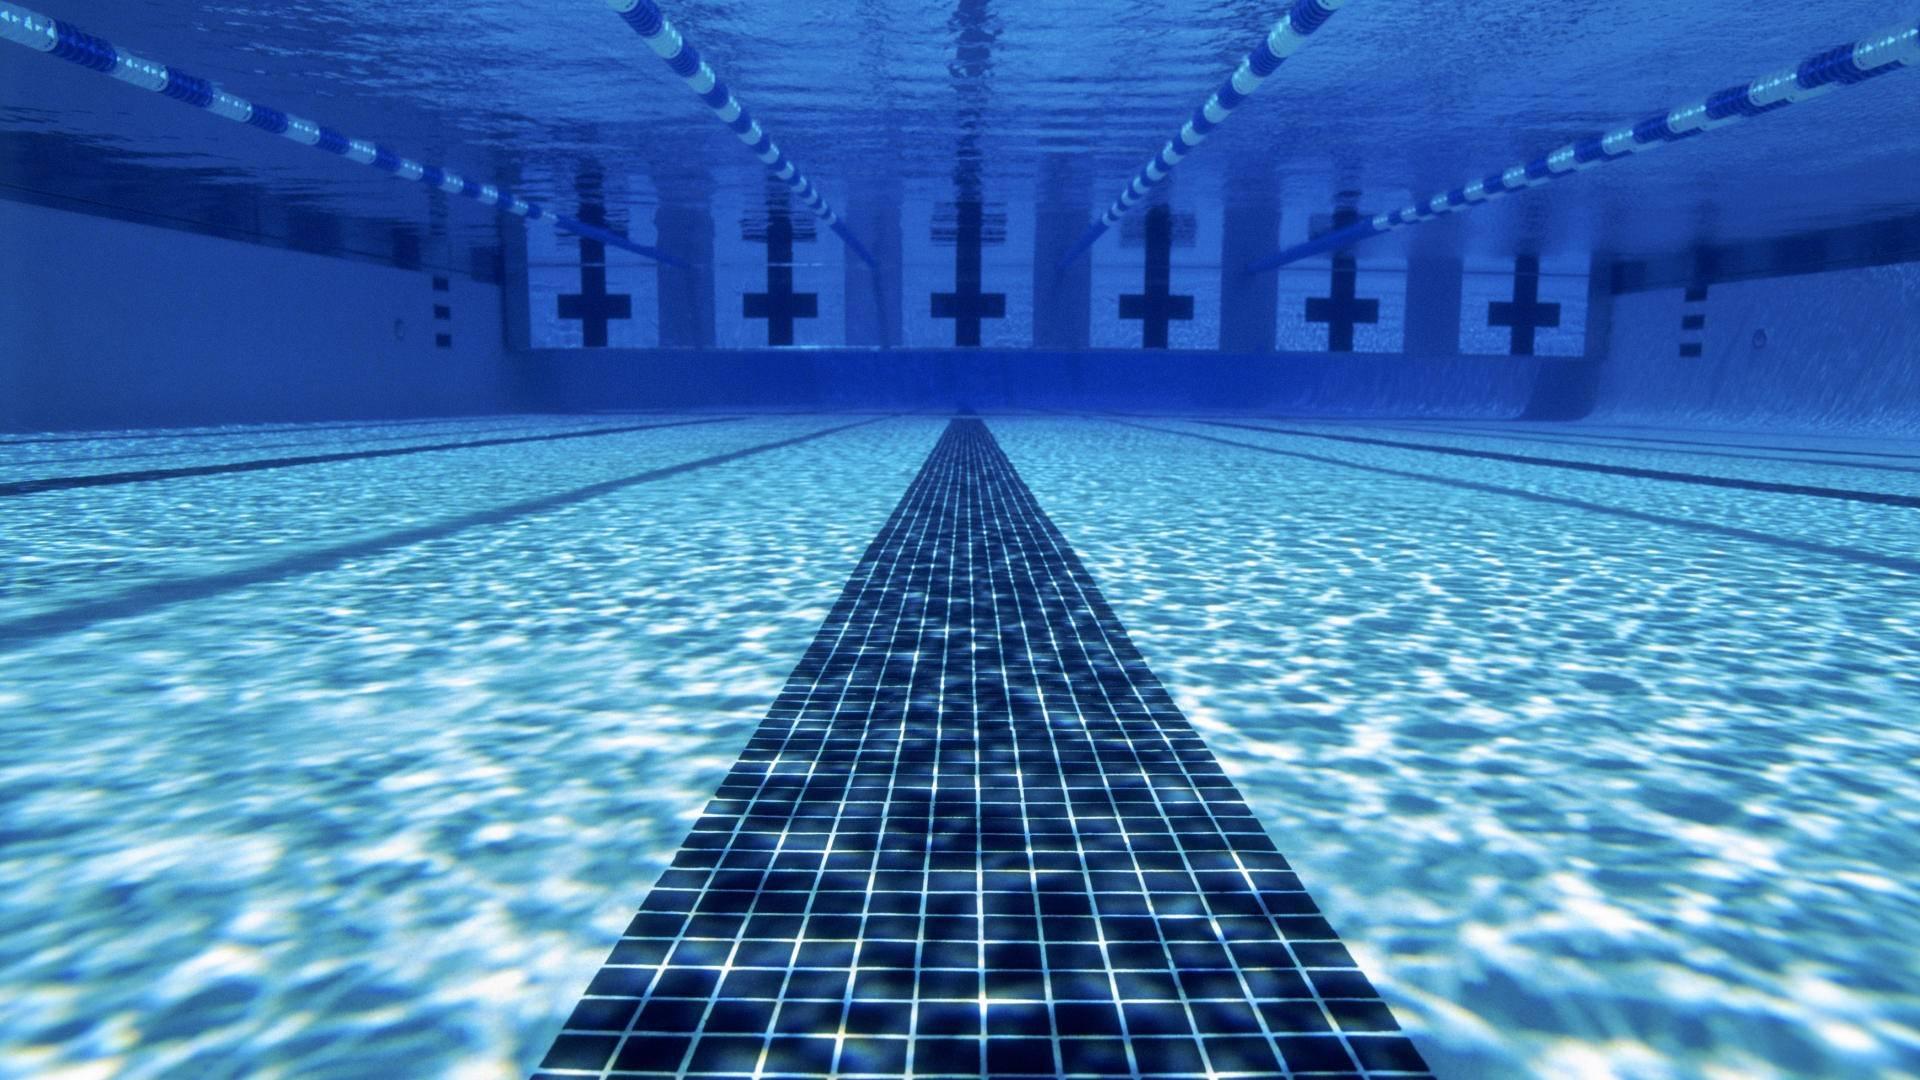 swimming-1920-1080-wallpaper